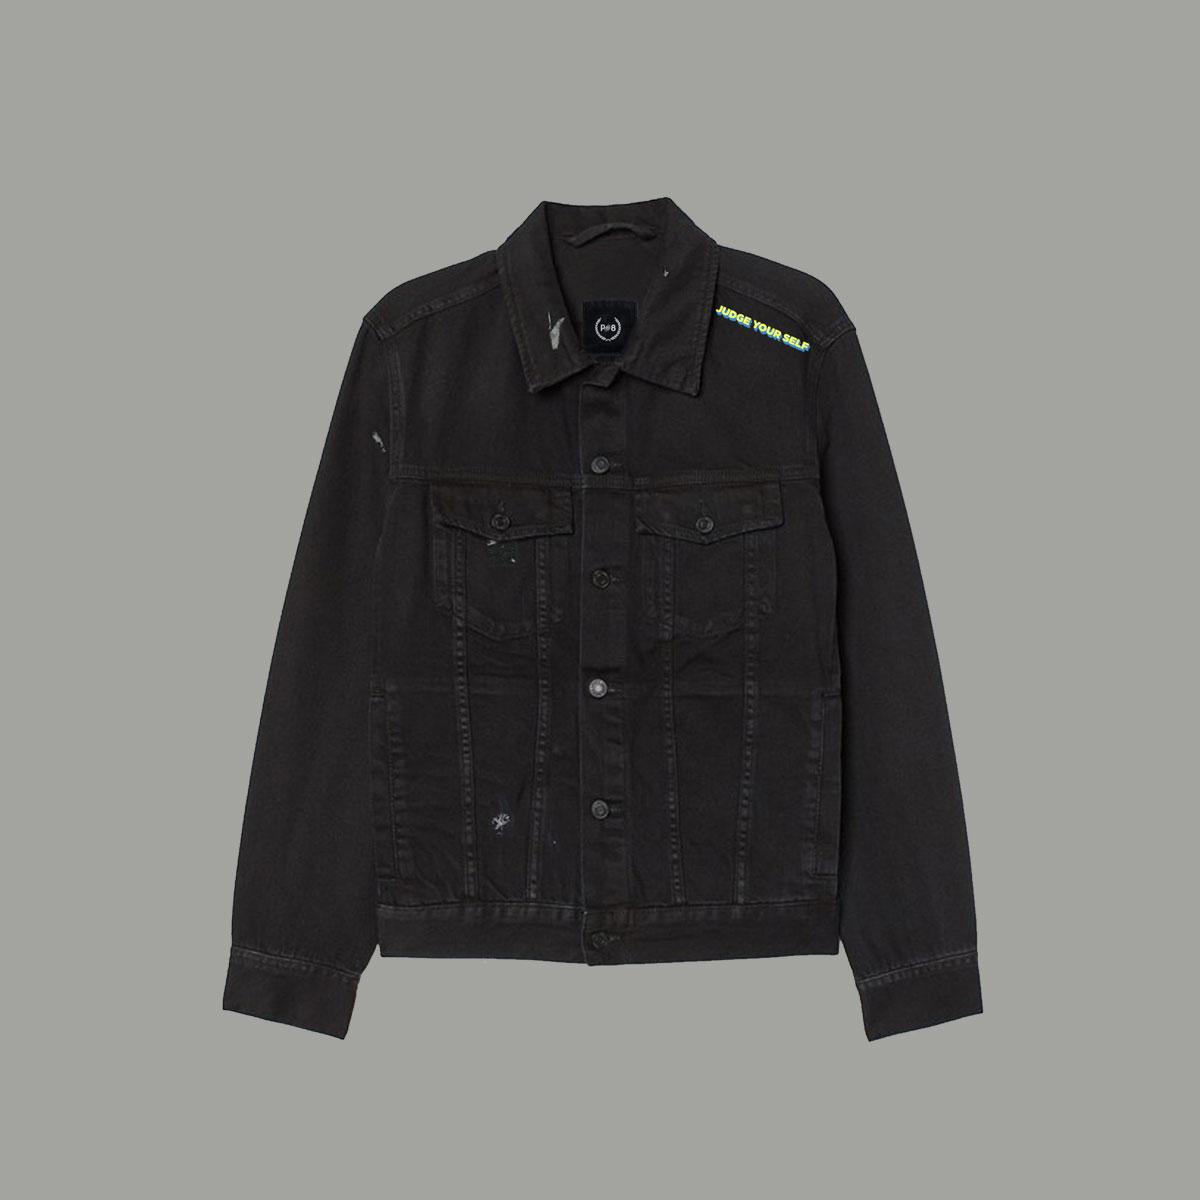 Judge Yourself Jeans Jacket - Black